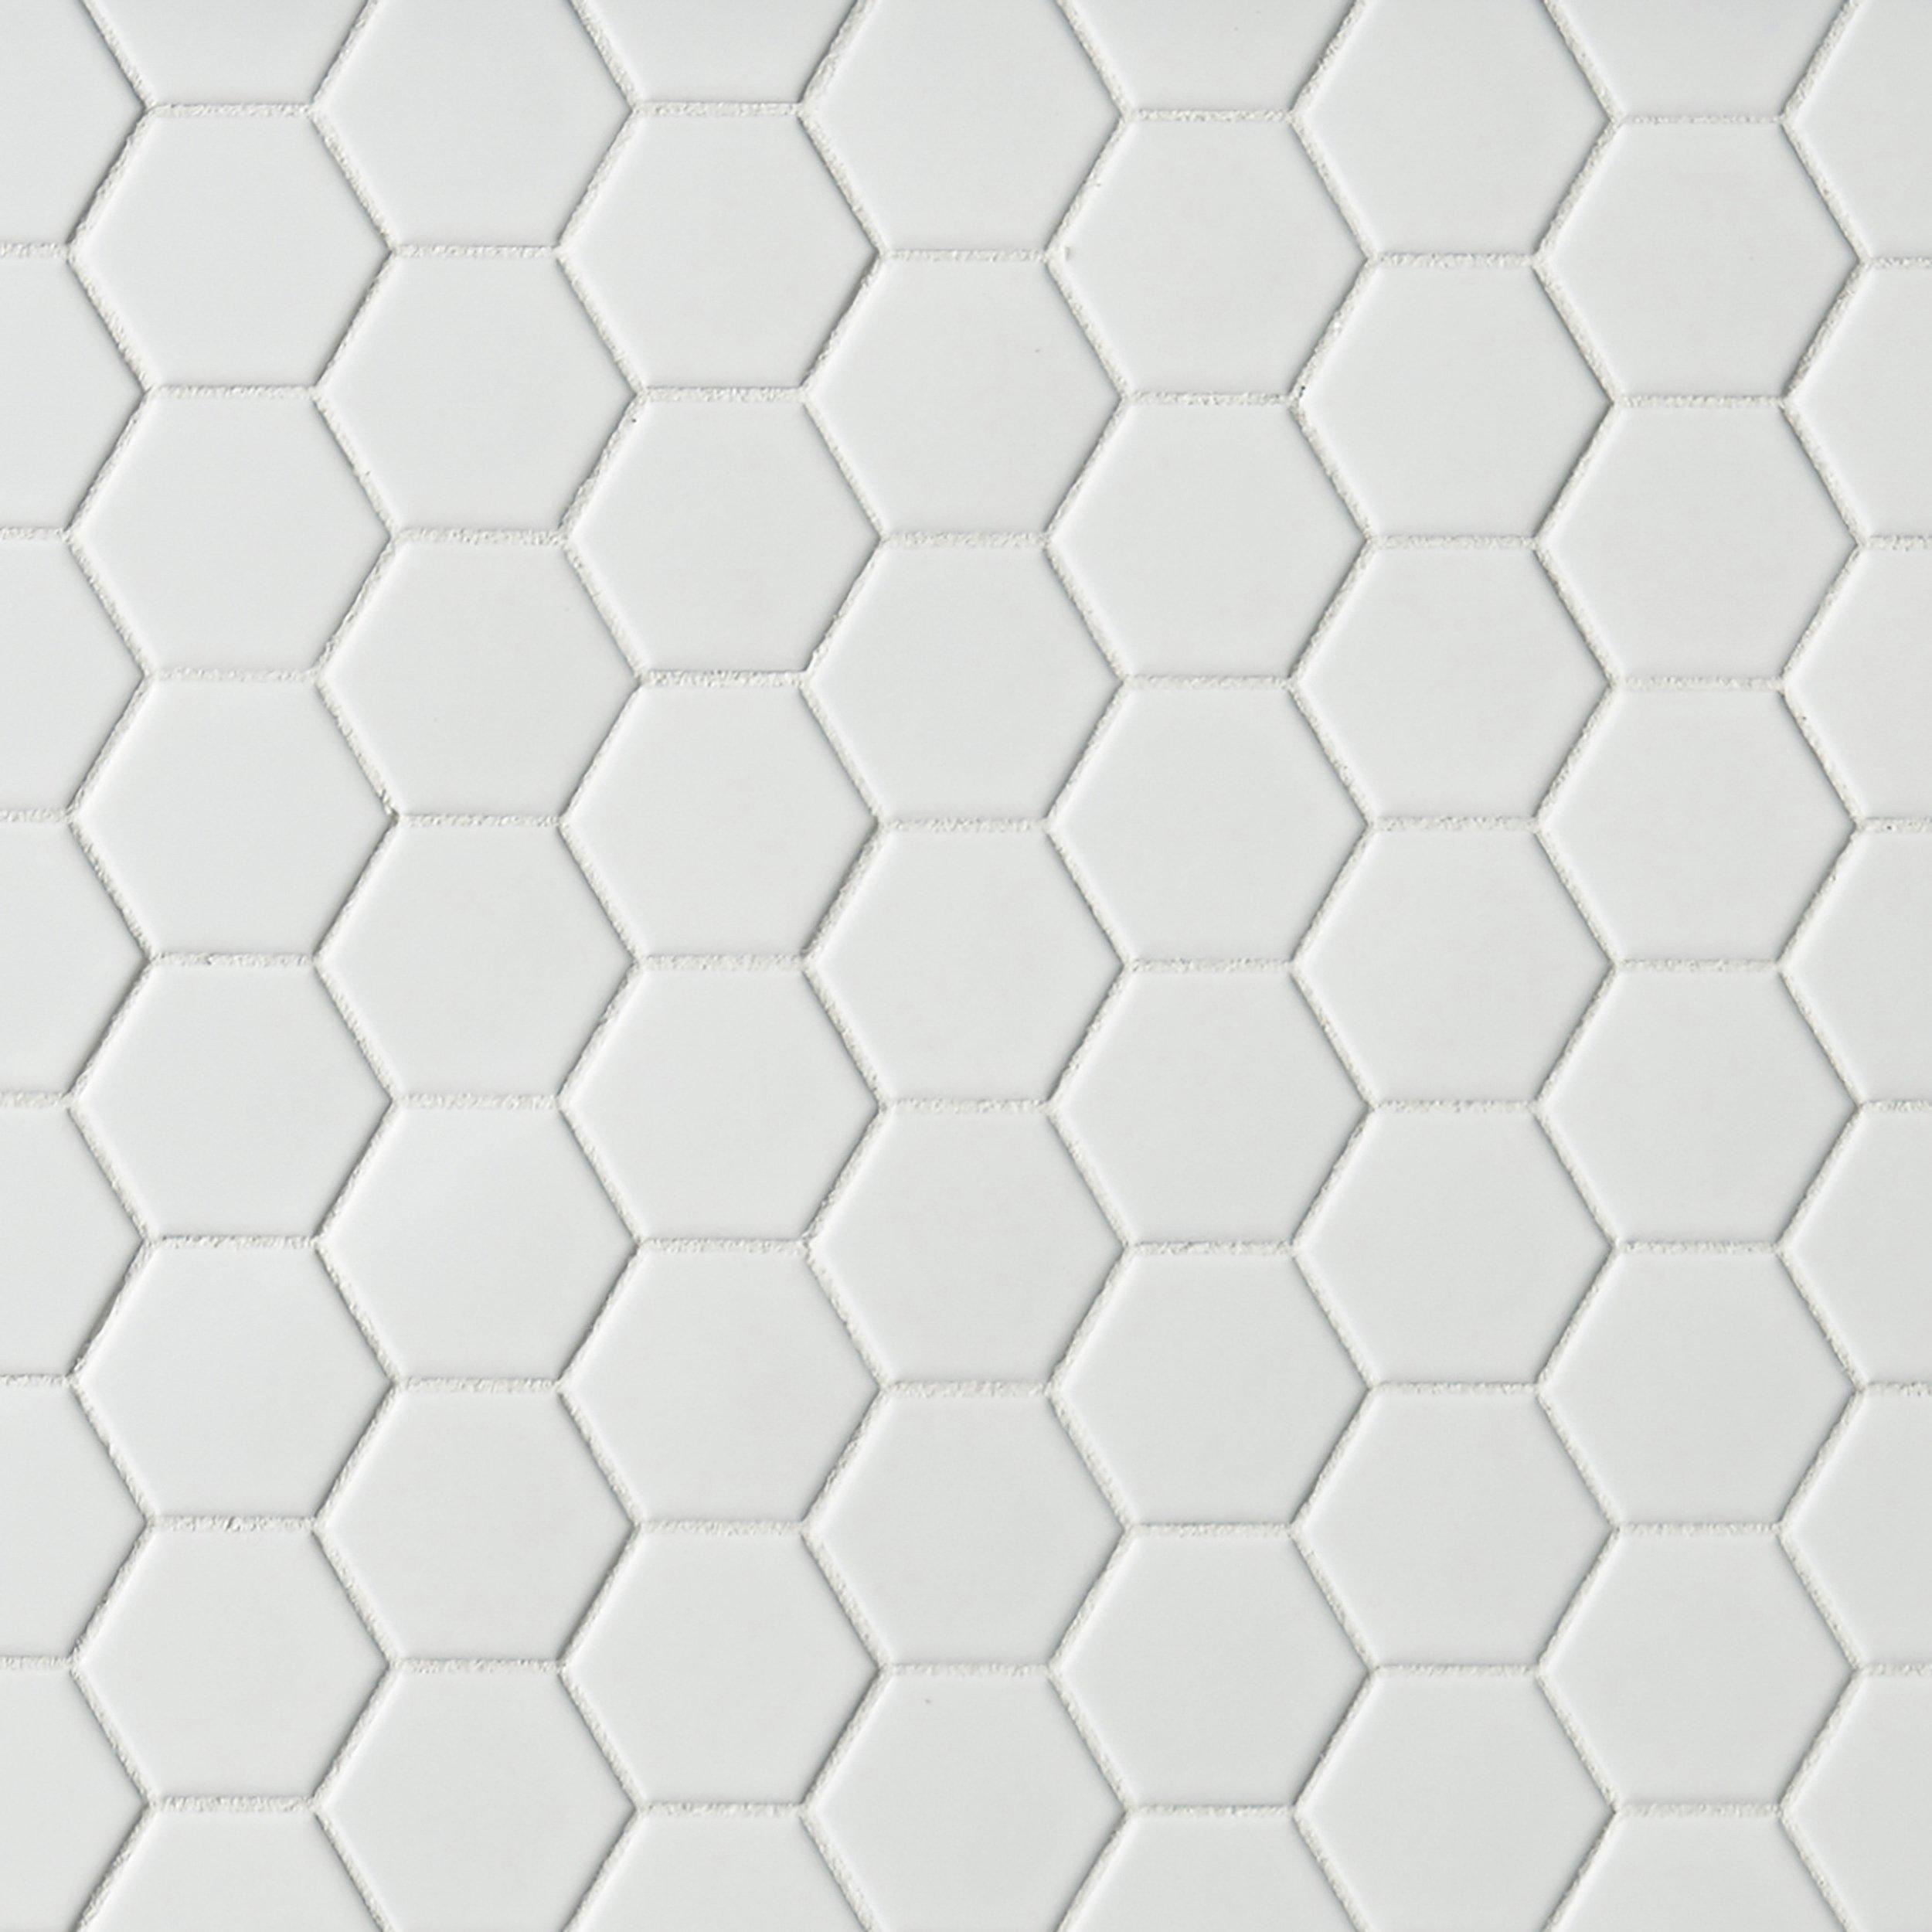 Metro White Matte Hexagon Porcelain Mosaic   12 X 12   100139260 | Floor  And Decor